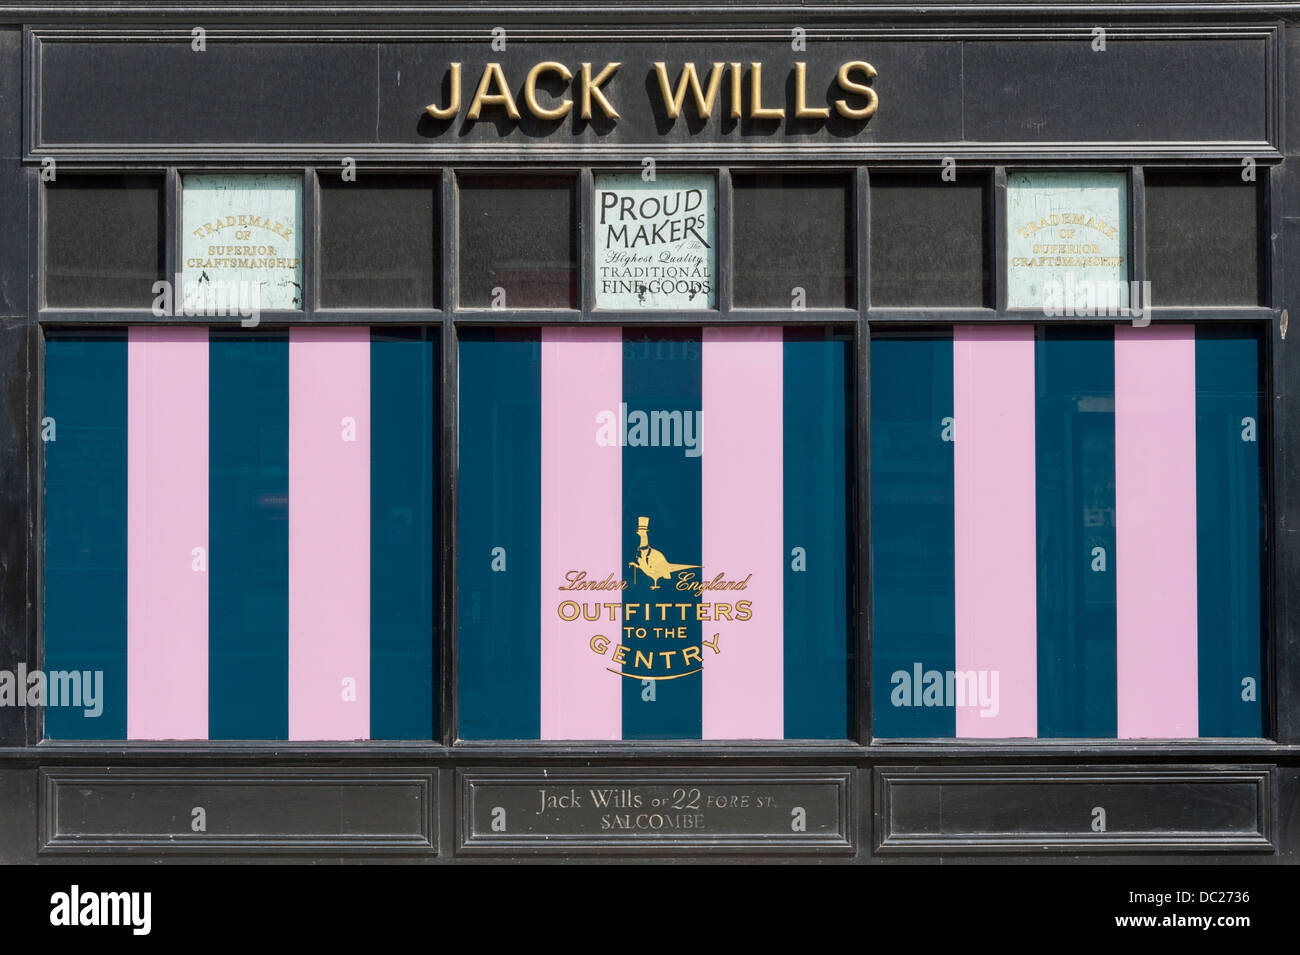 Jack Wills Shop Richmond Upon Thames Surrey London UK - Stock Image